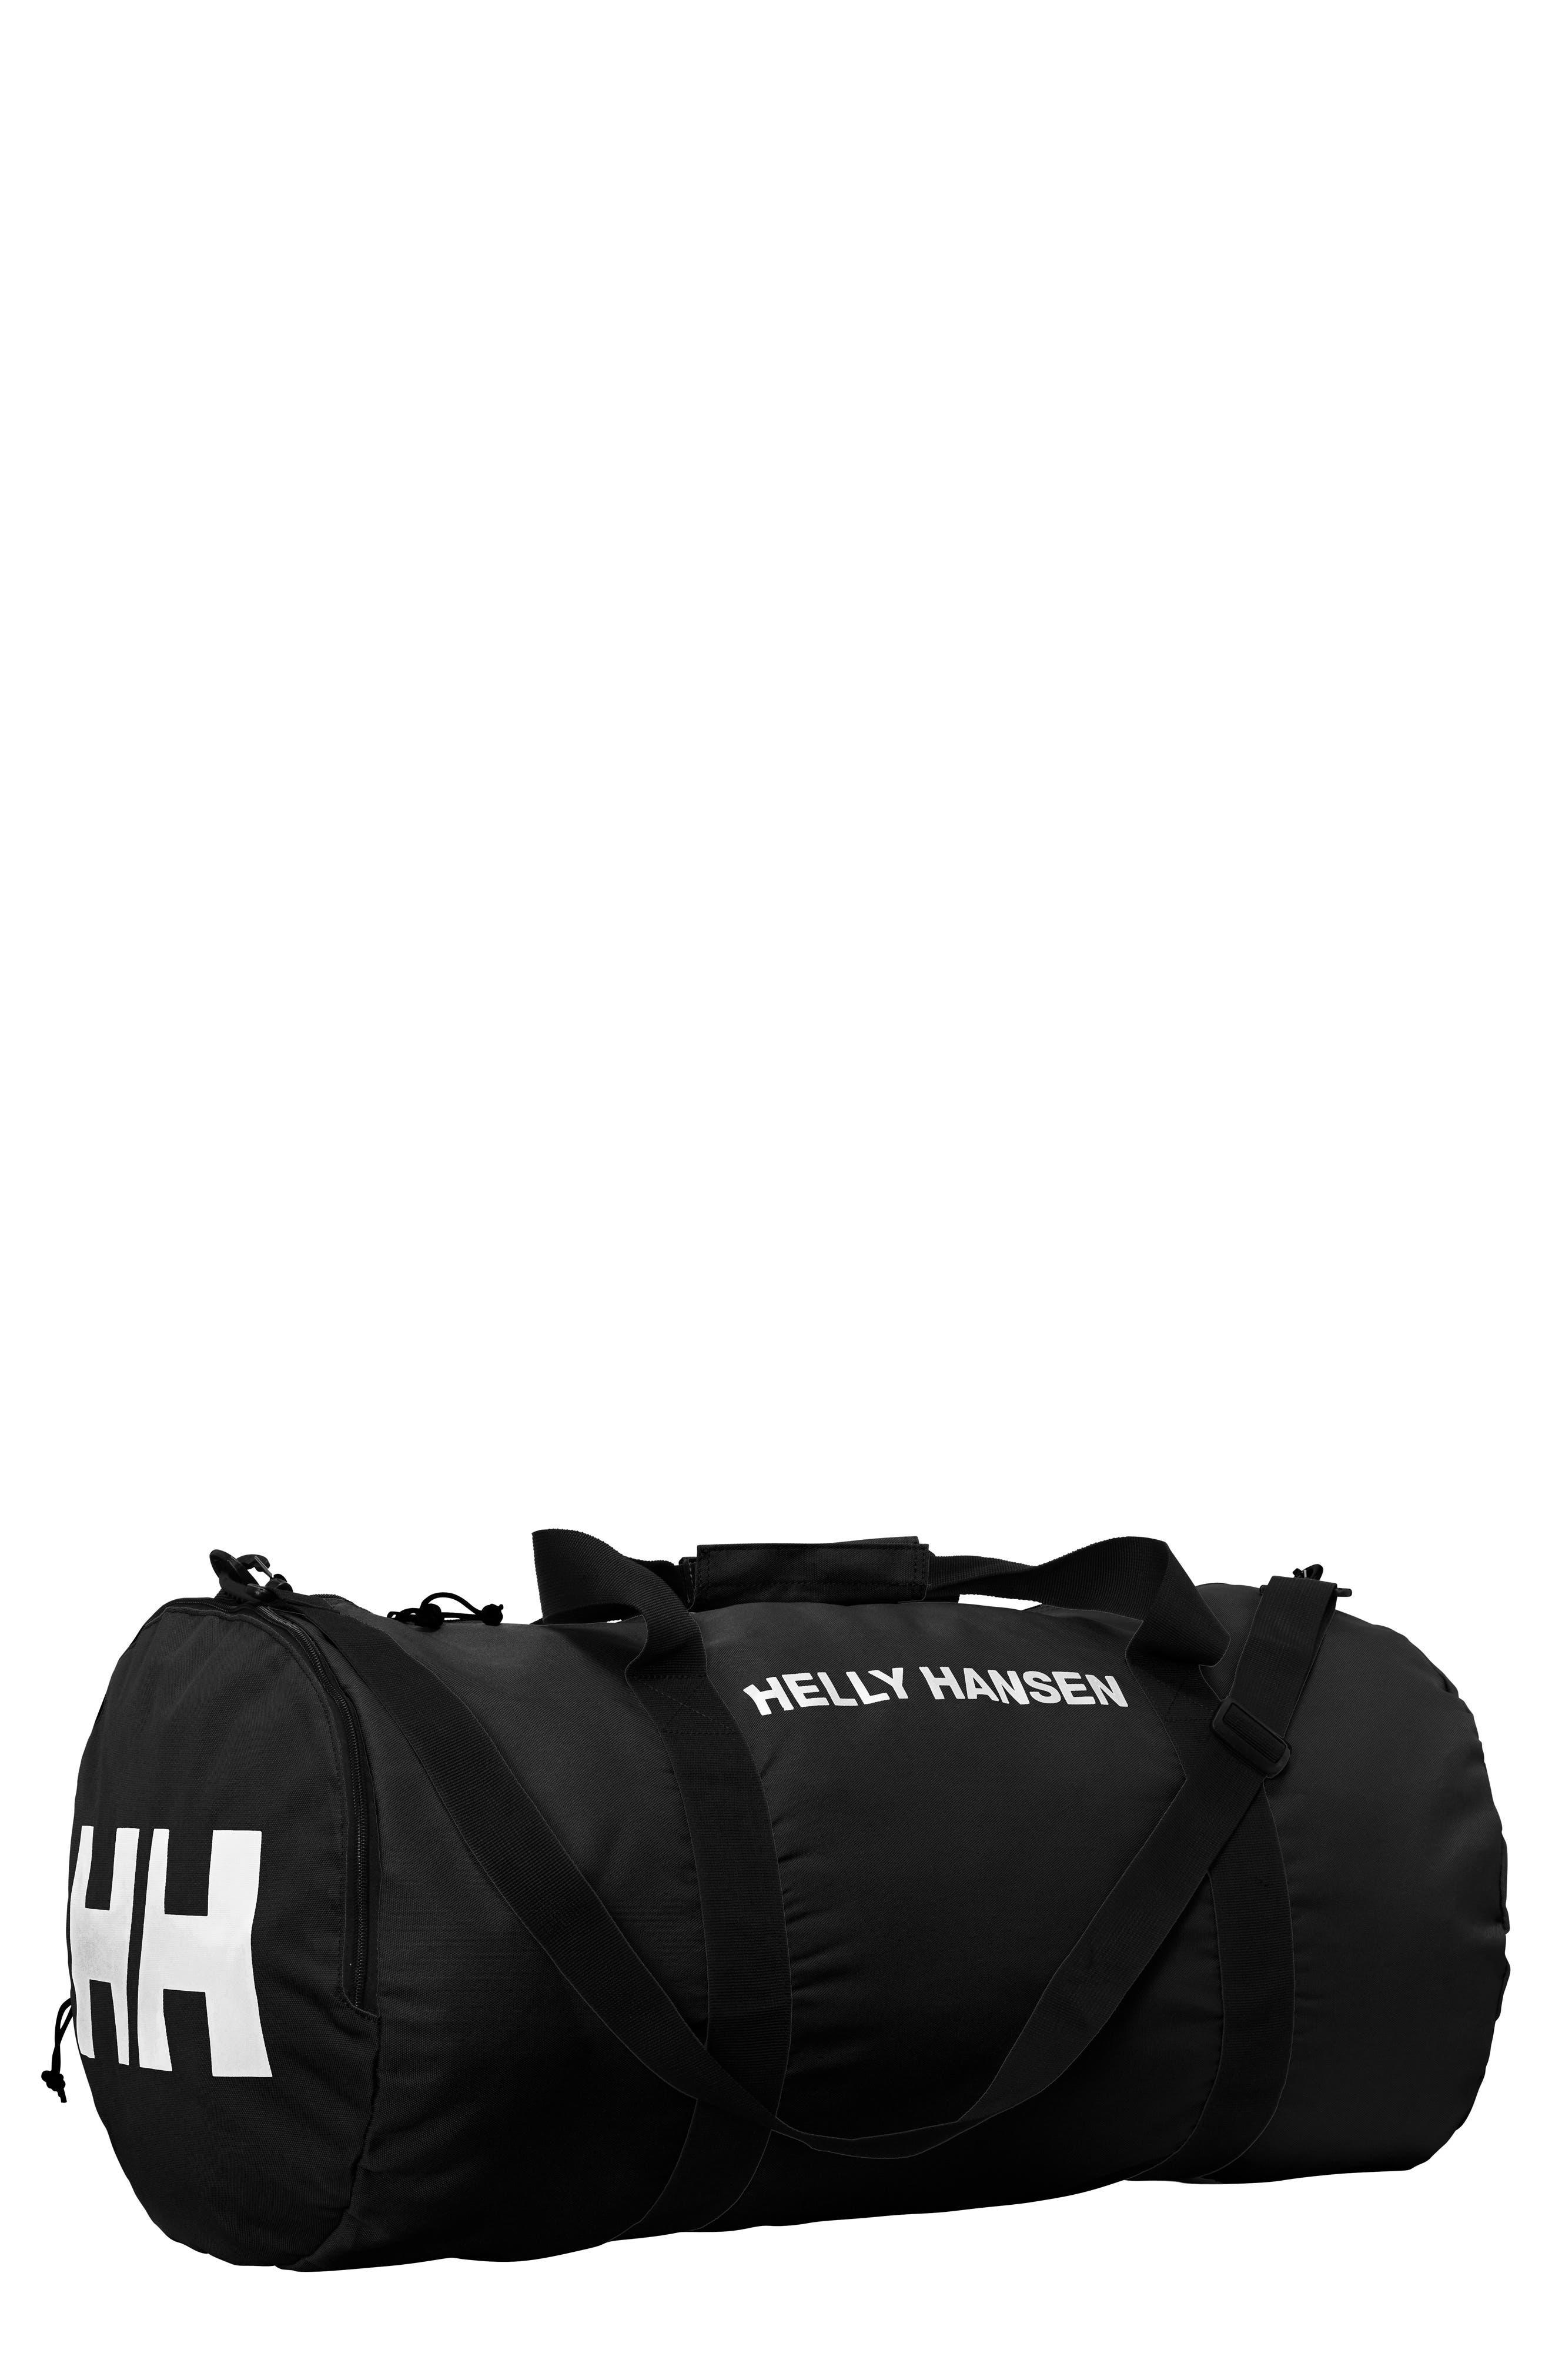 Helly Hansen Large Packable Duffel Bag